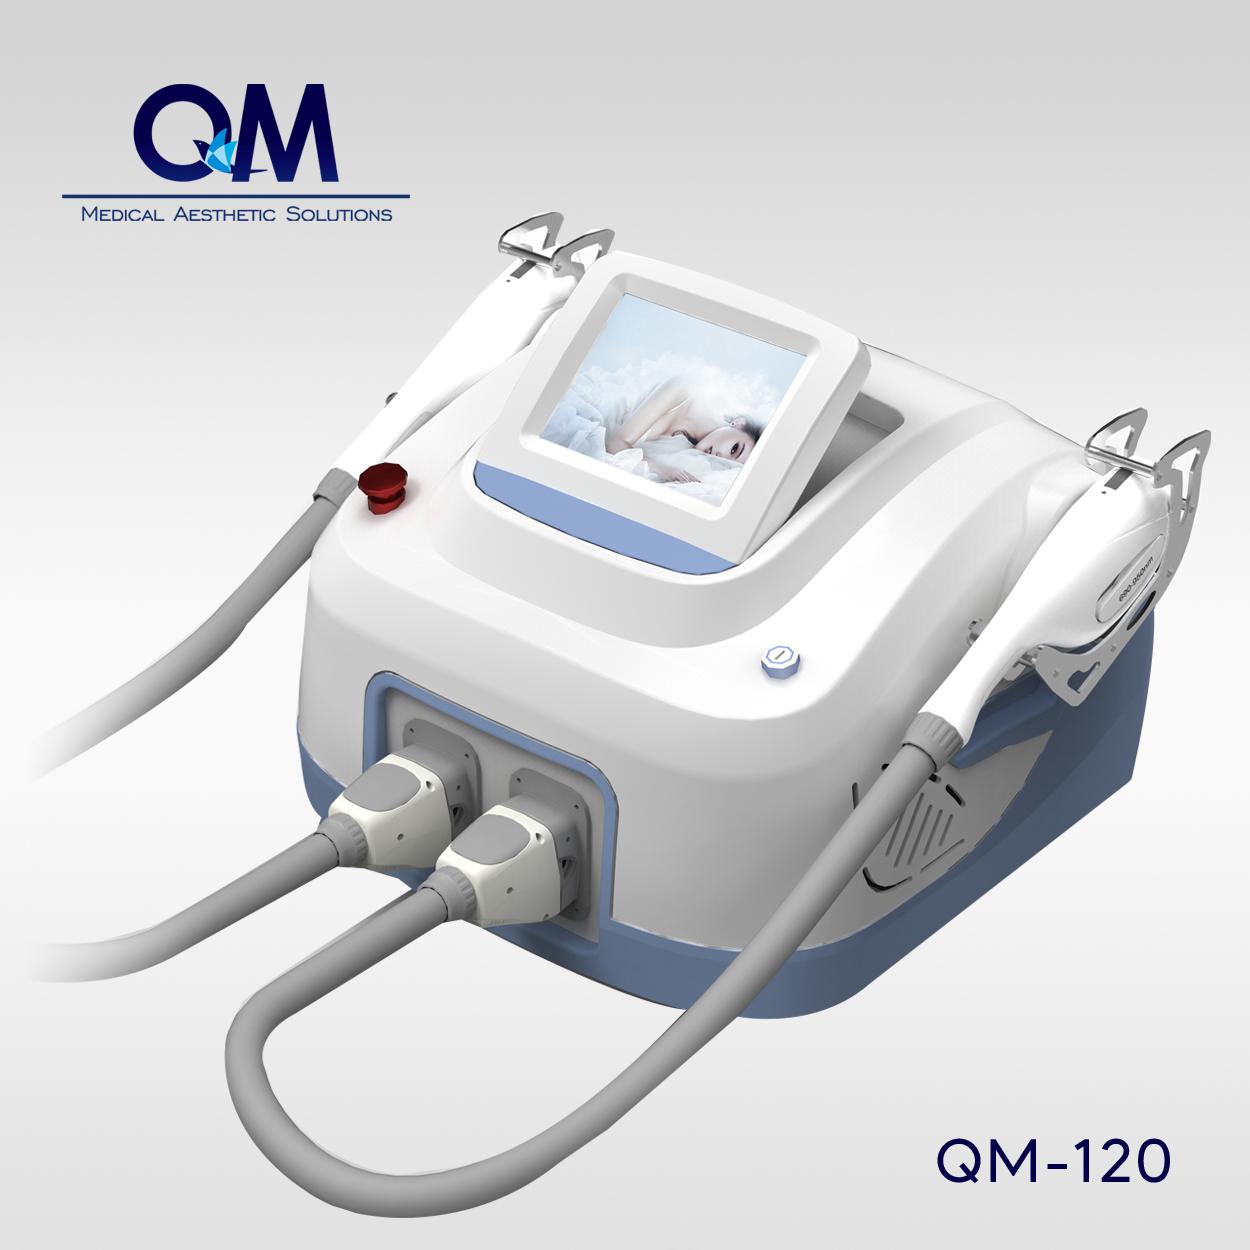 Portable IPL+SHR Machine for Hair Removal and Skin Rejuvenation